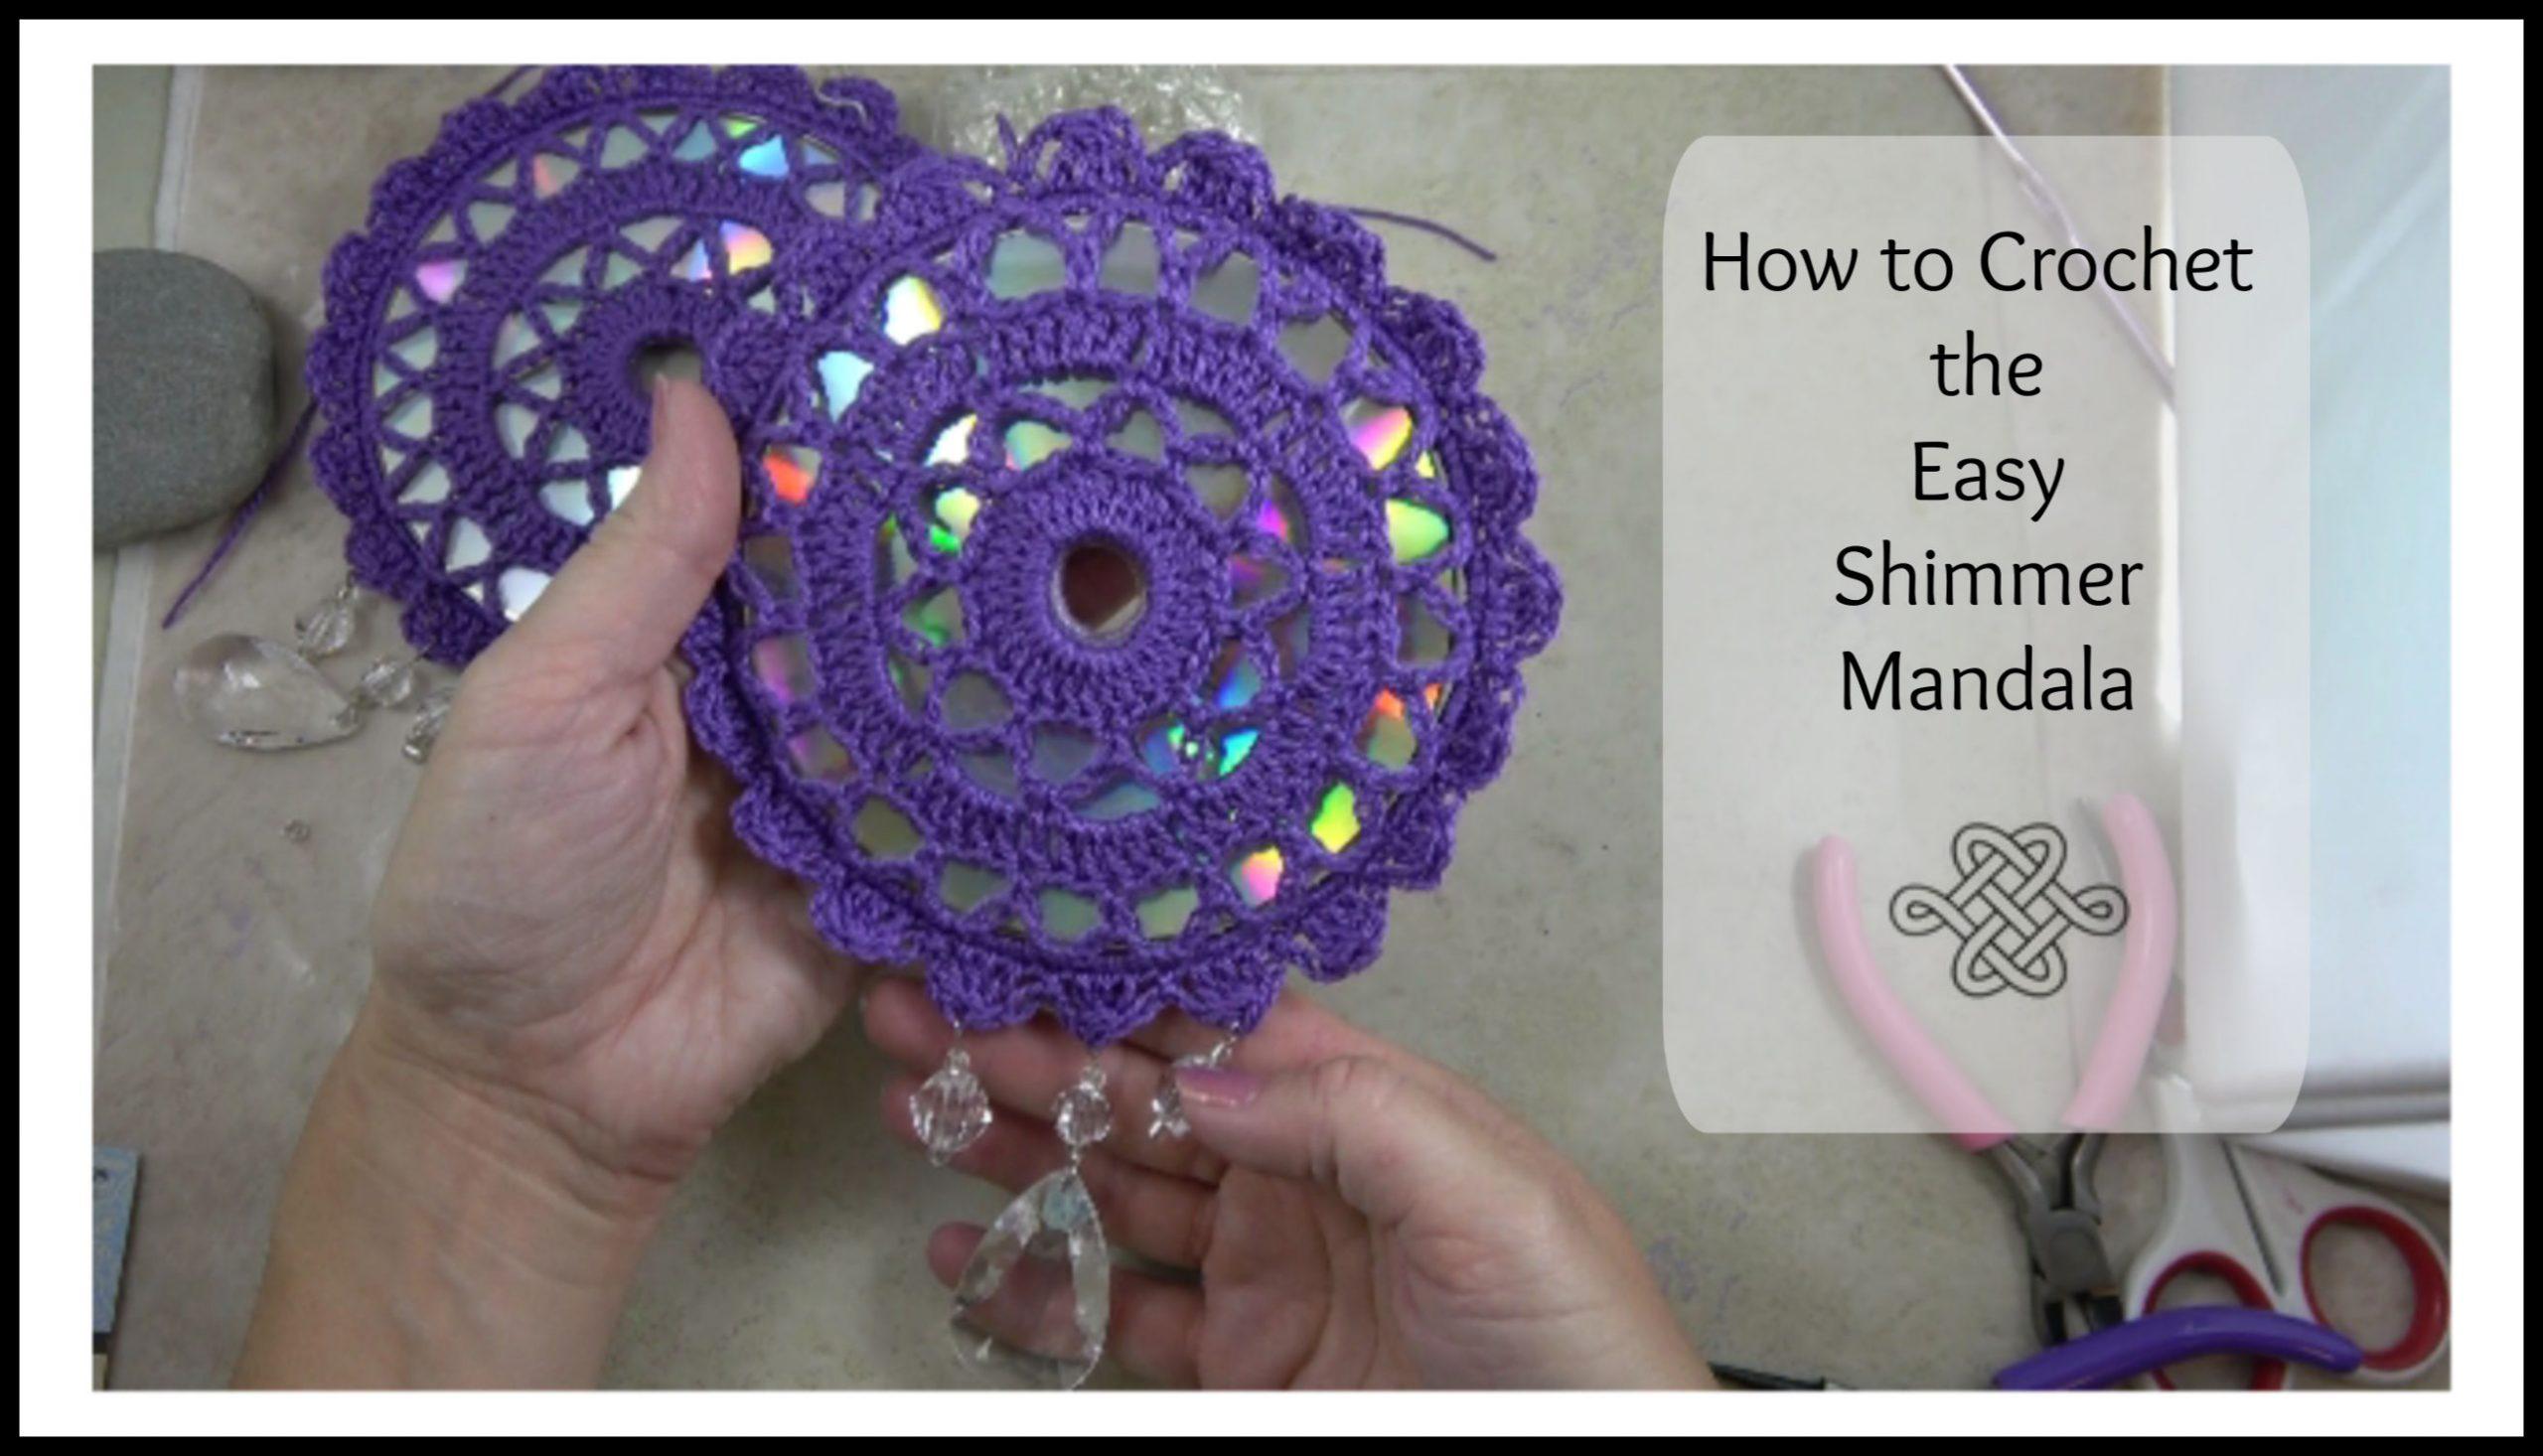 lacy crocheted mandala on a shimmery cd